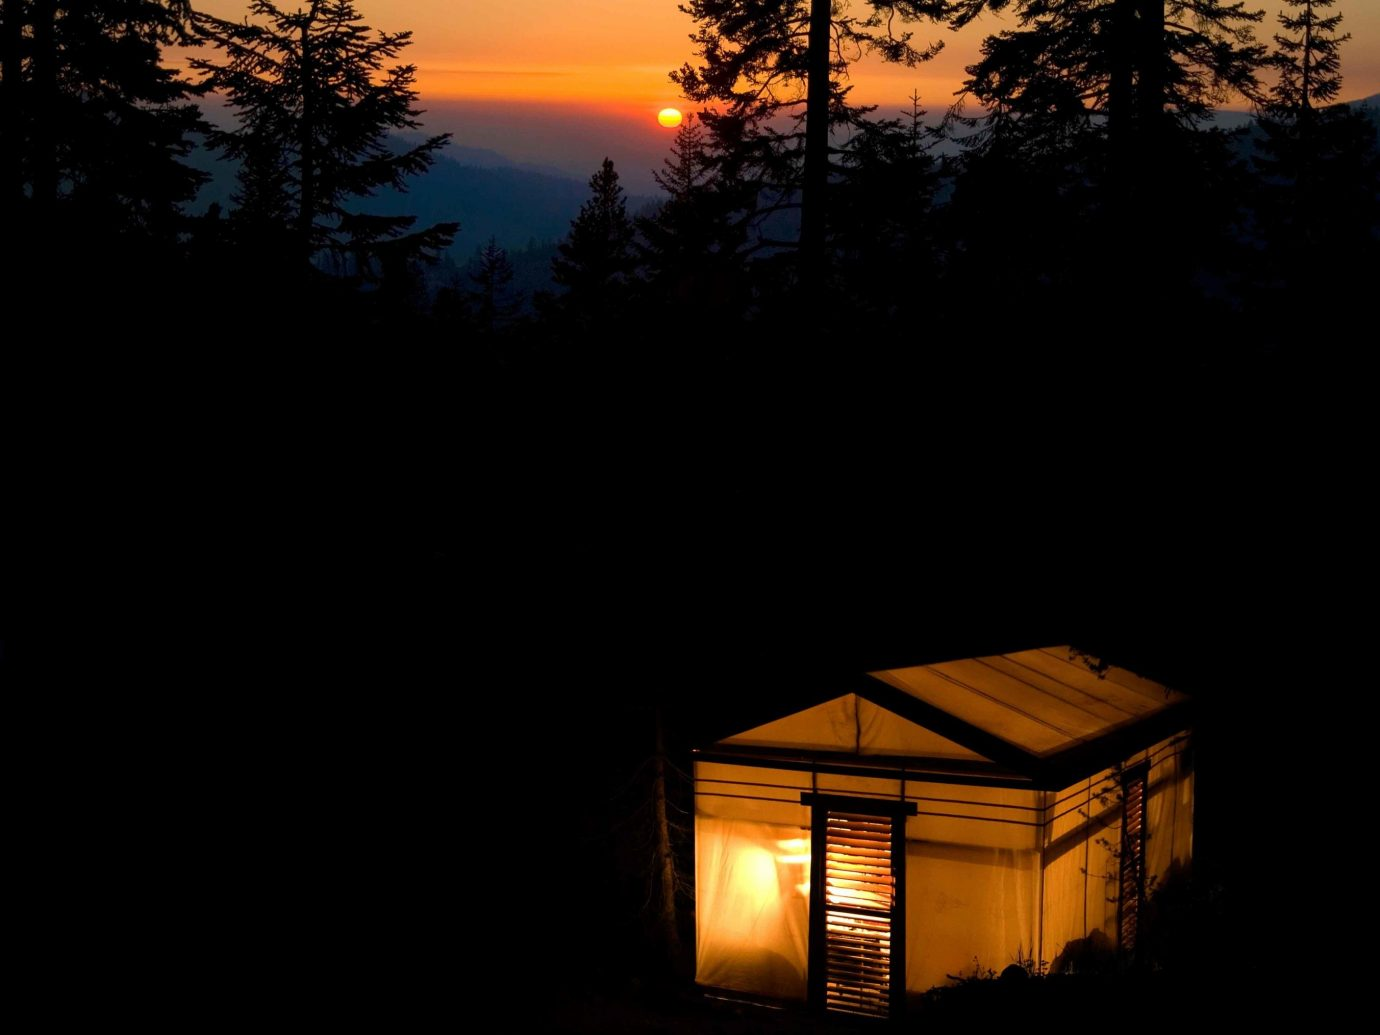 Glamping Outdoors + Adventure Trip Ideas tree outdoor sky Sunset night atmosphere light sunrise evening morning darkness dawn Sun sunlight dusk reflection dark setting clouds